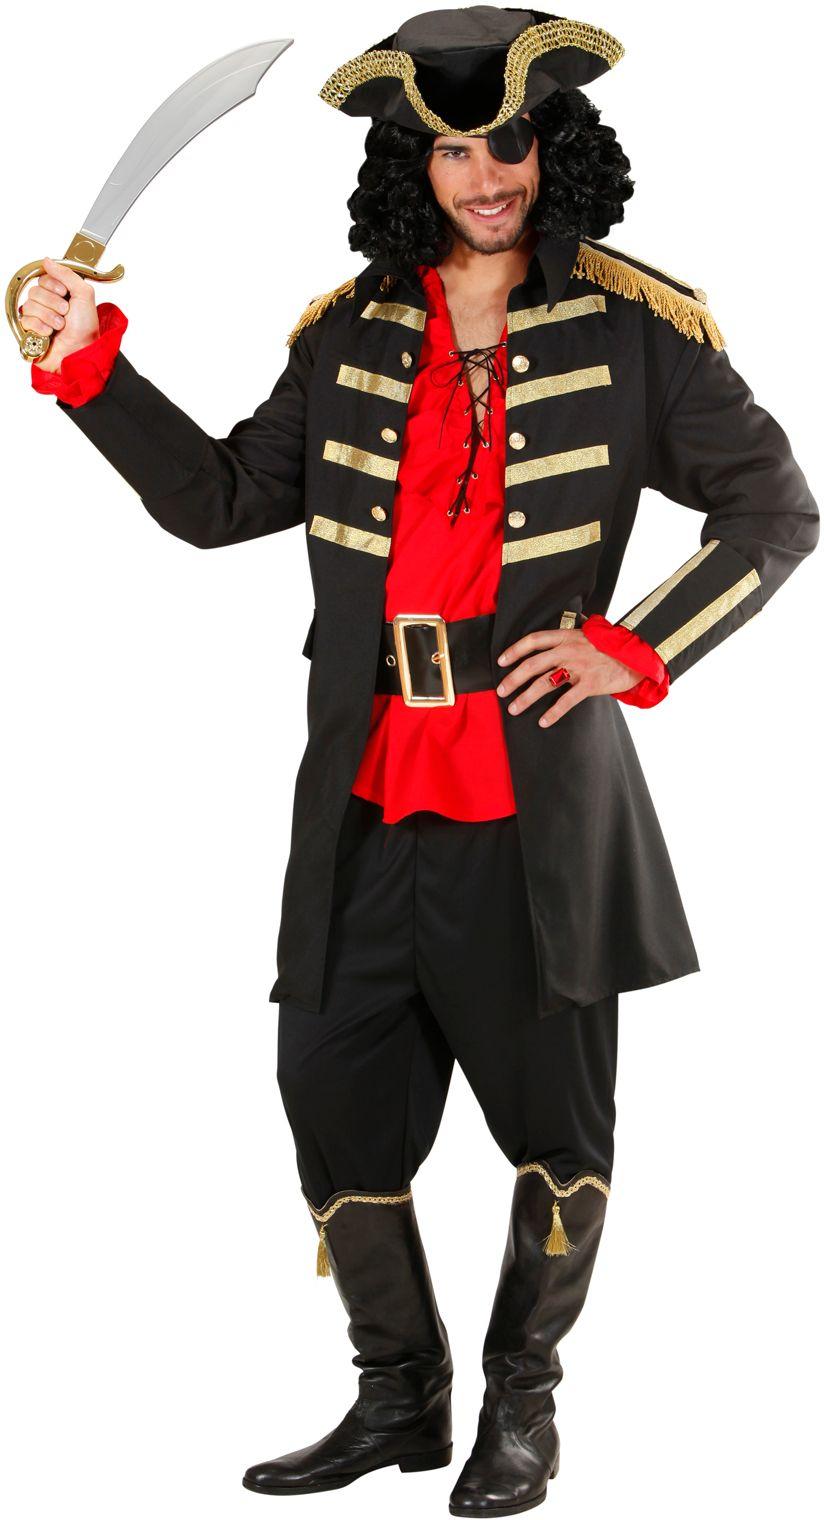 Zwarte piraat/kapitein kostuum